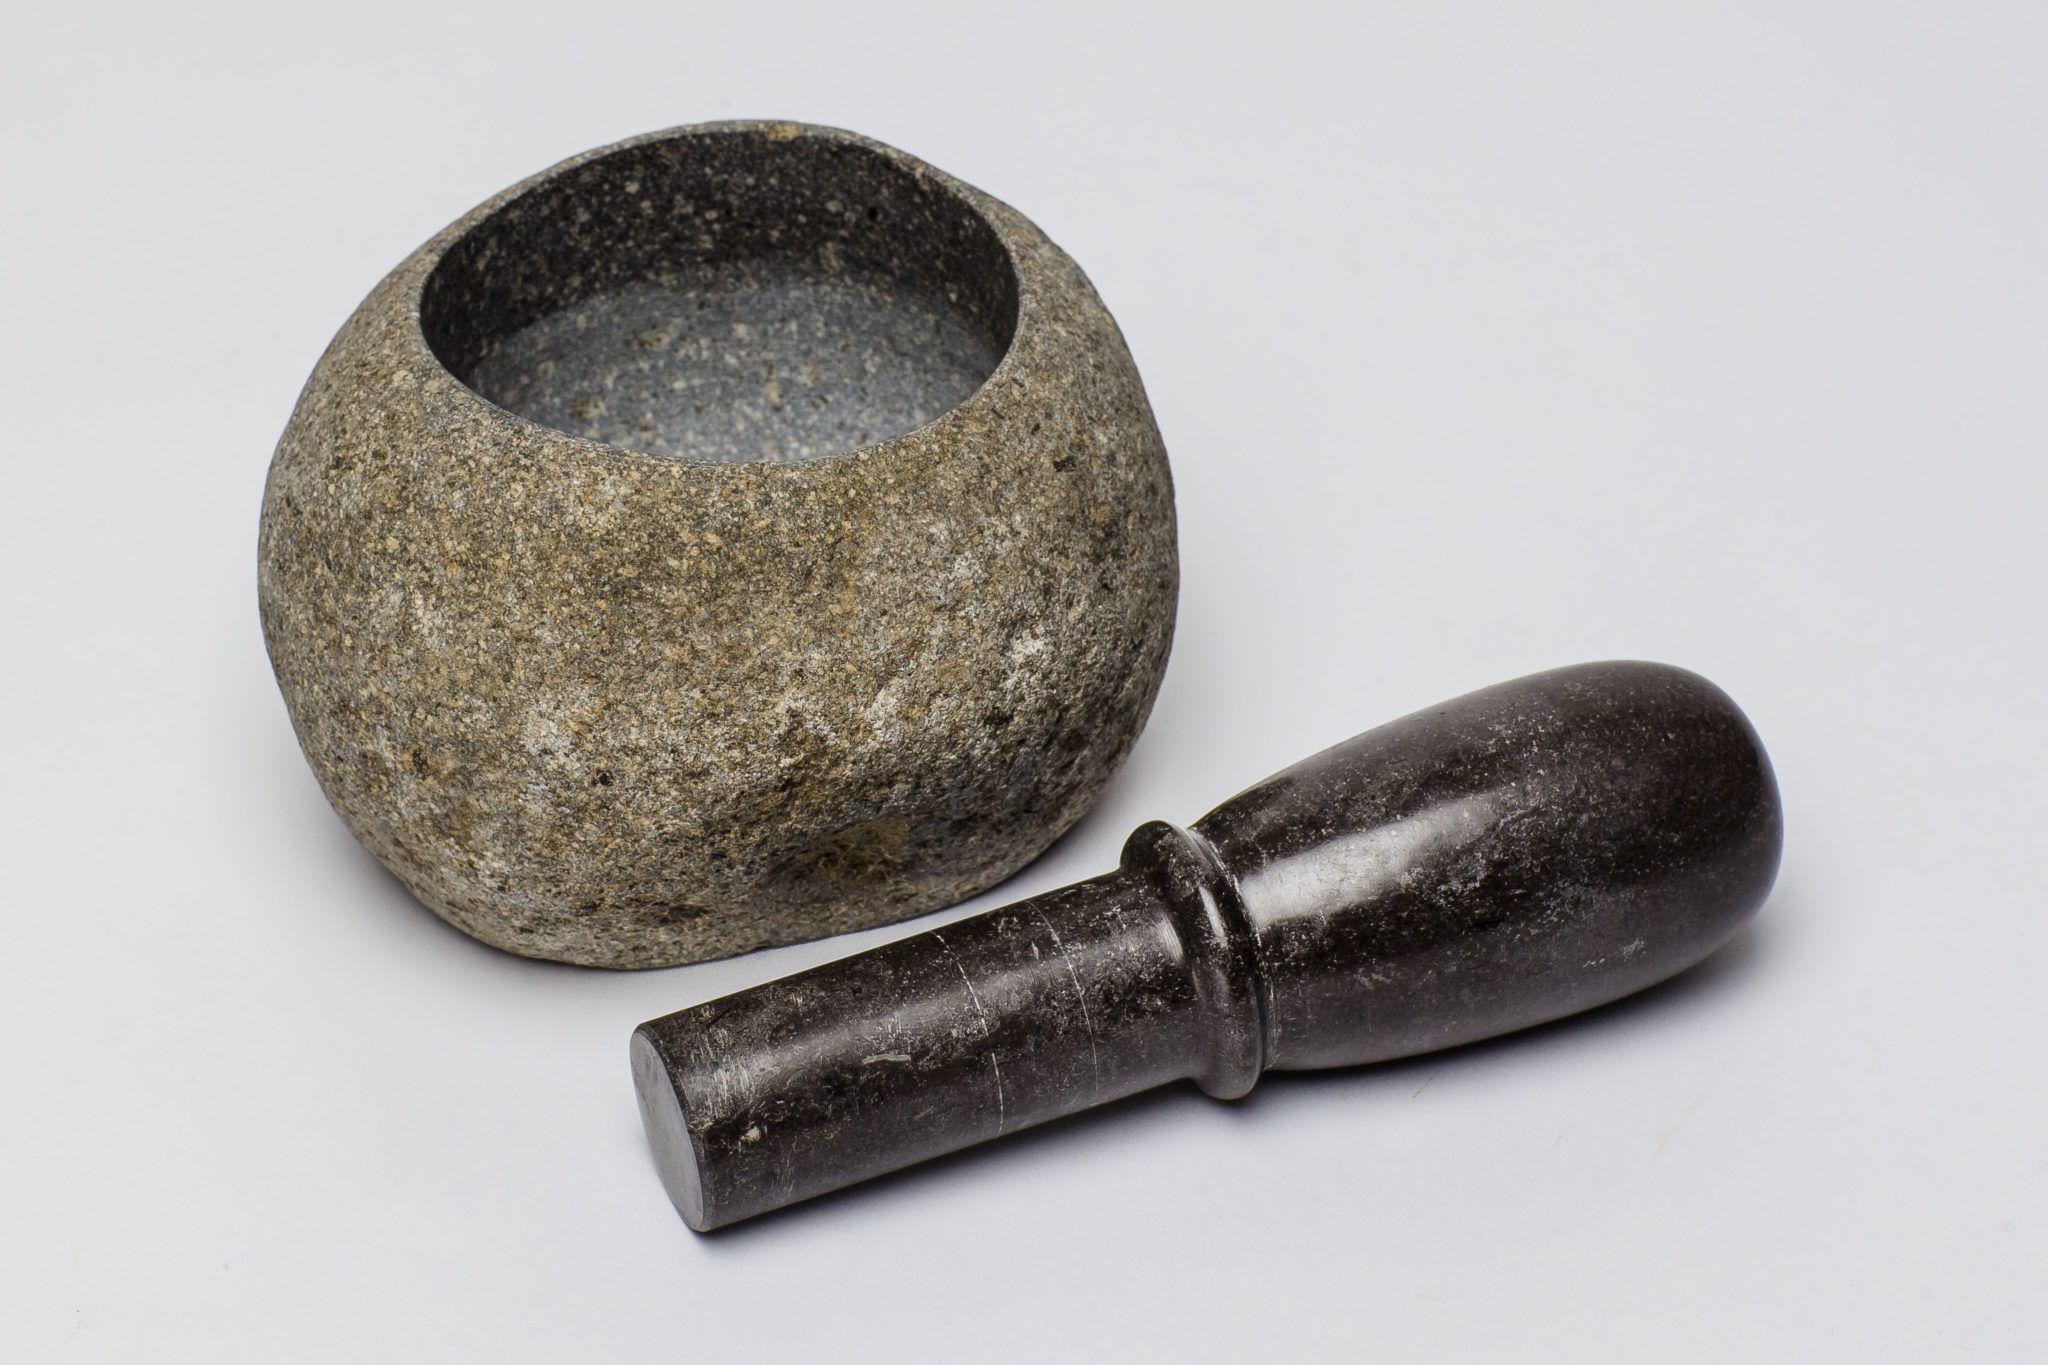 riverstone-pestle-mortar-swatch-2